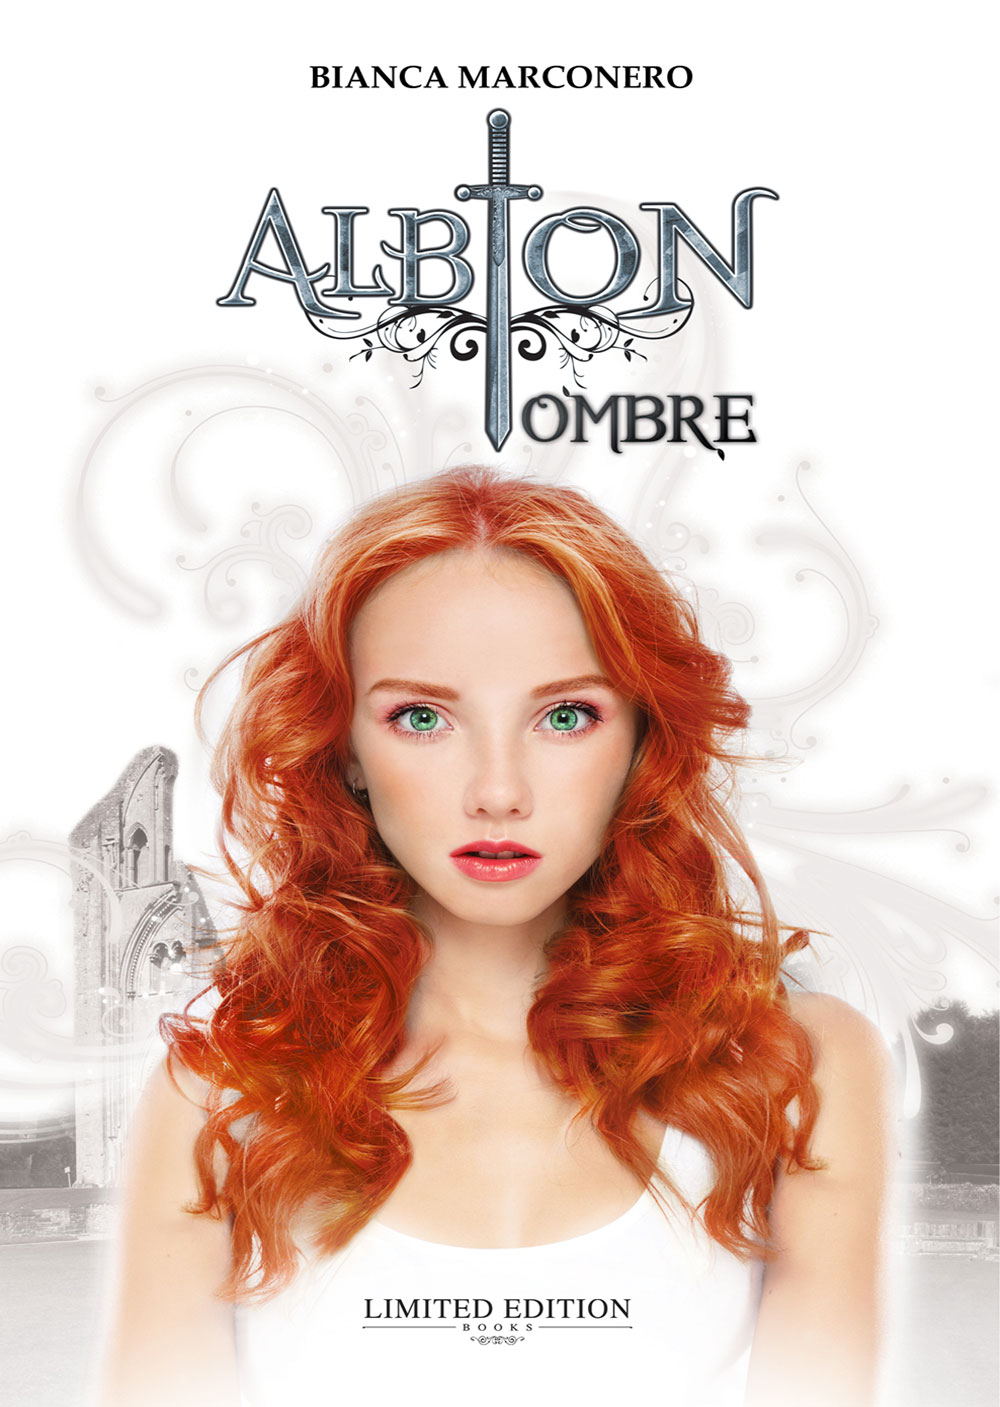 Albion 2. Ombre